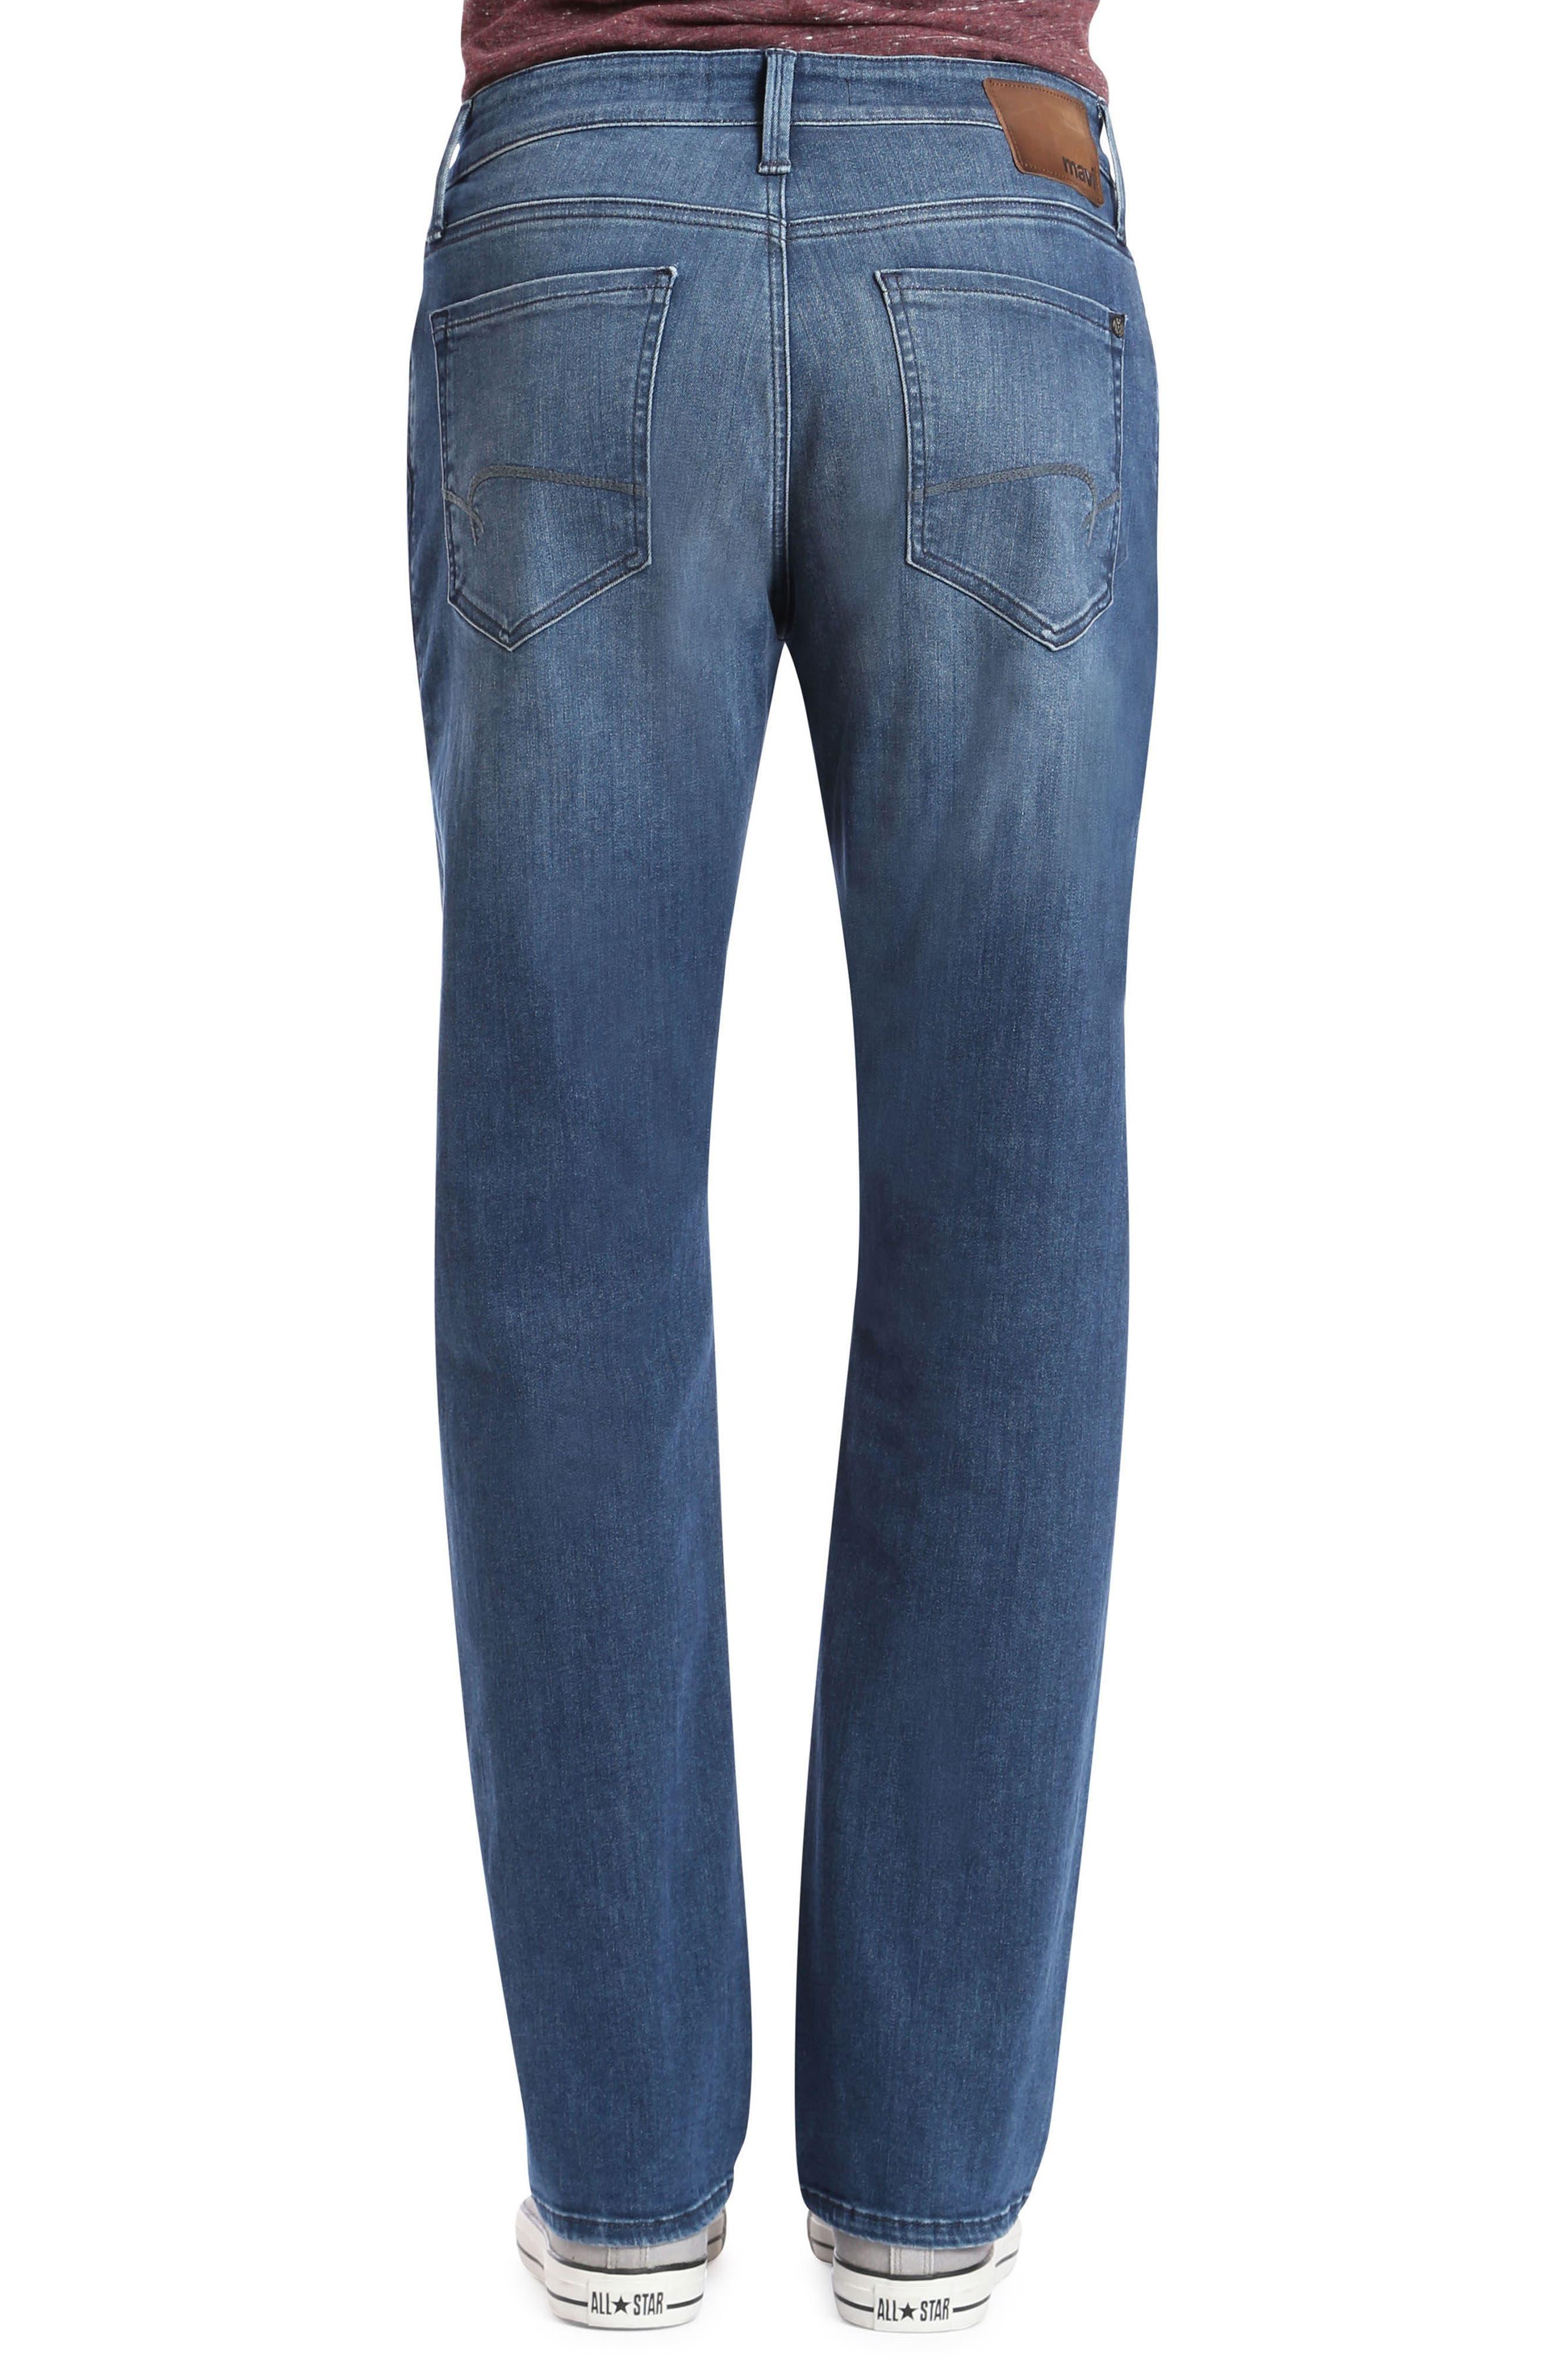 Myles Straight Leg Jeans,                             Alternate thumbnail 2, color,                             Mid Tonal Williamsburg